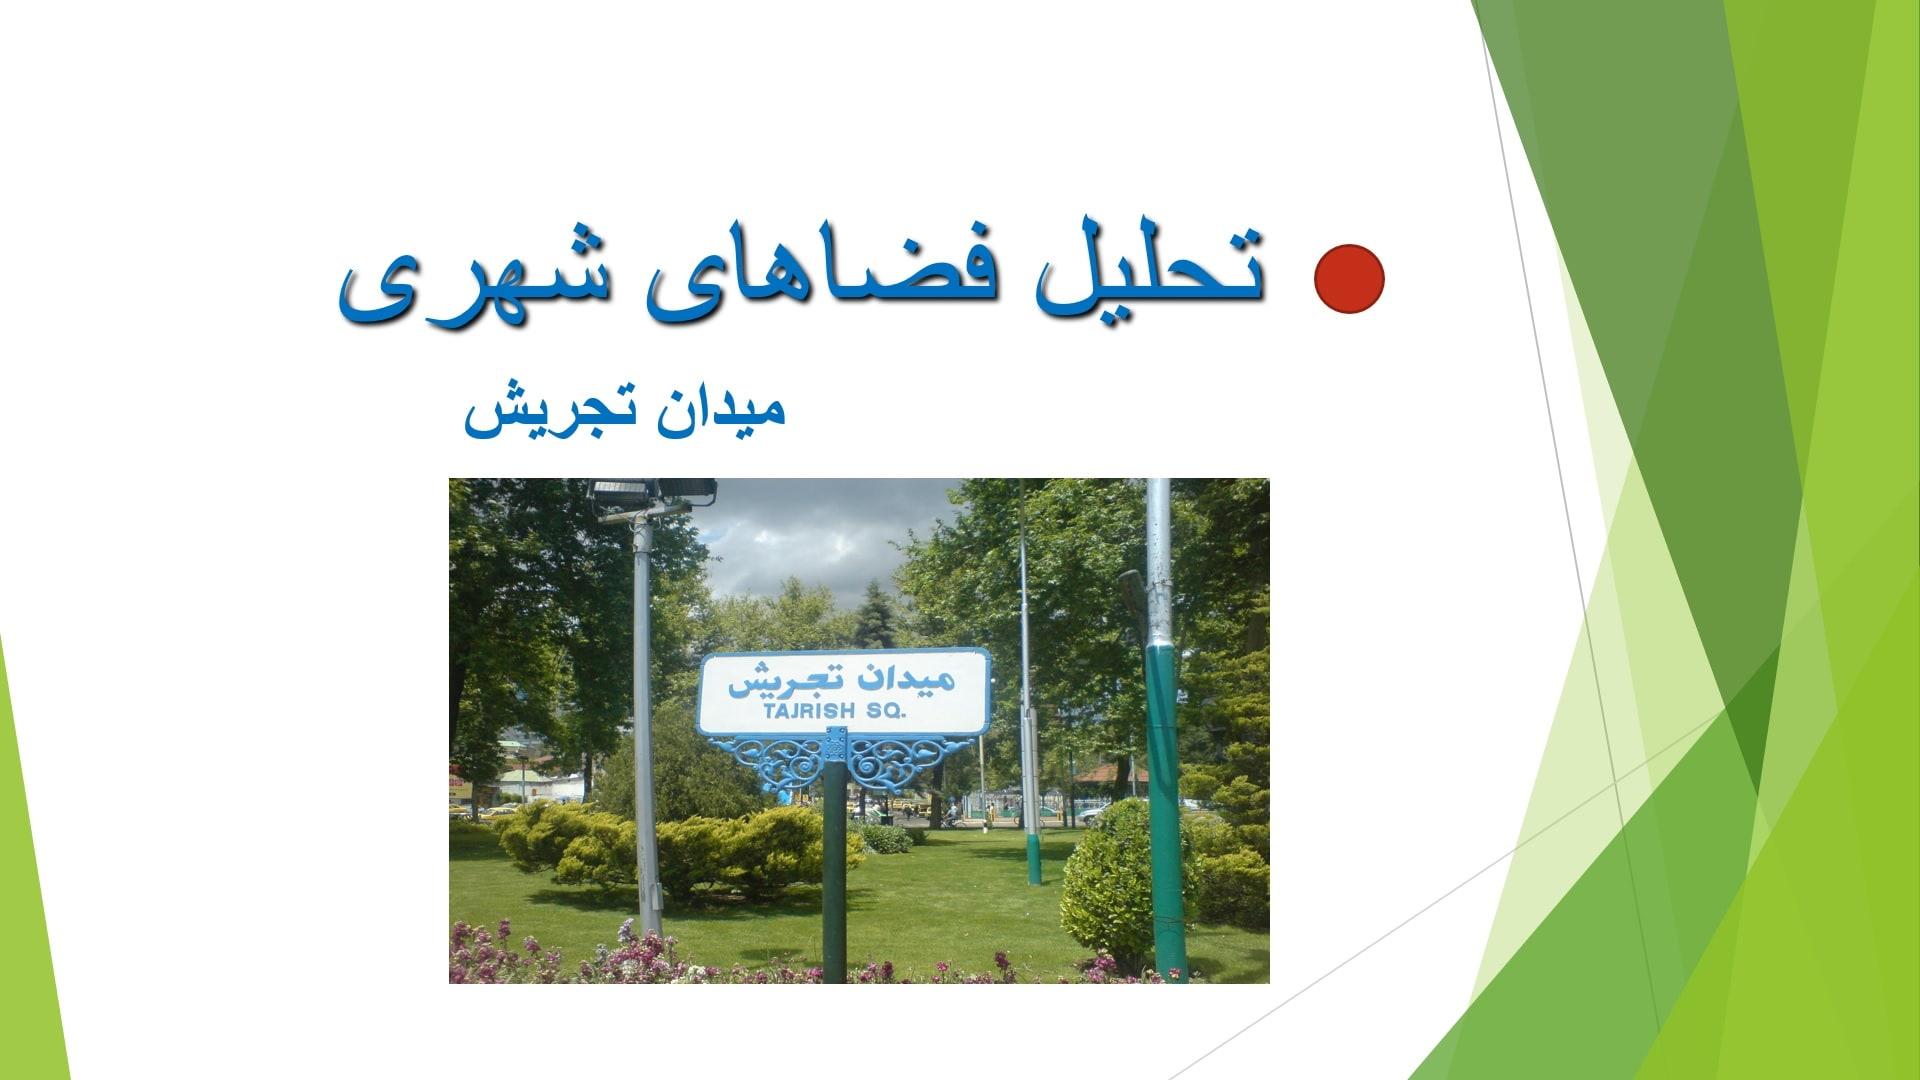 پاورپوینت تحلیل میدان تجریش تهران